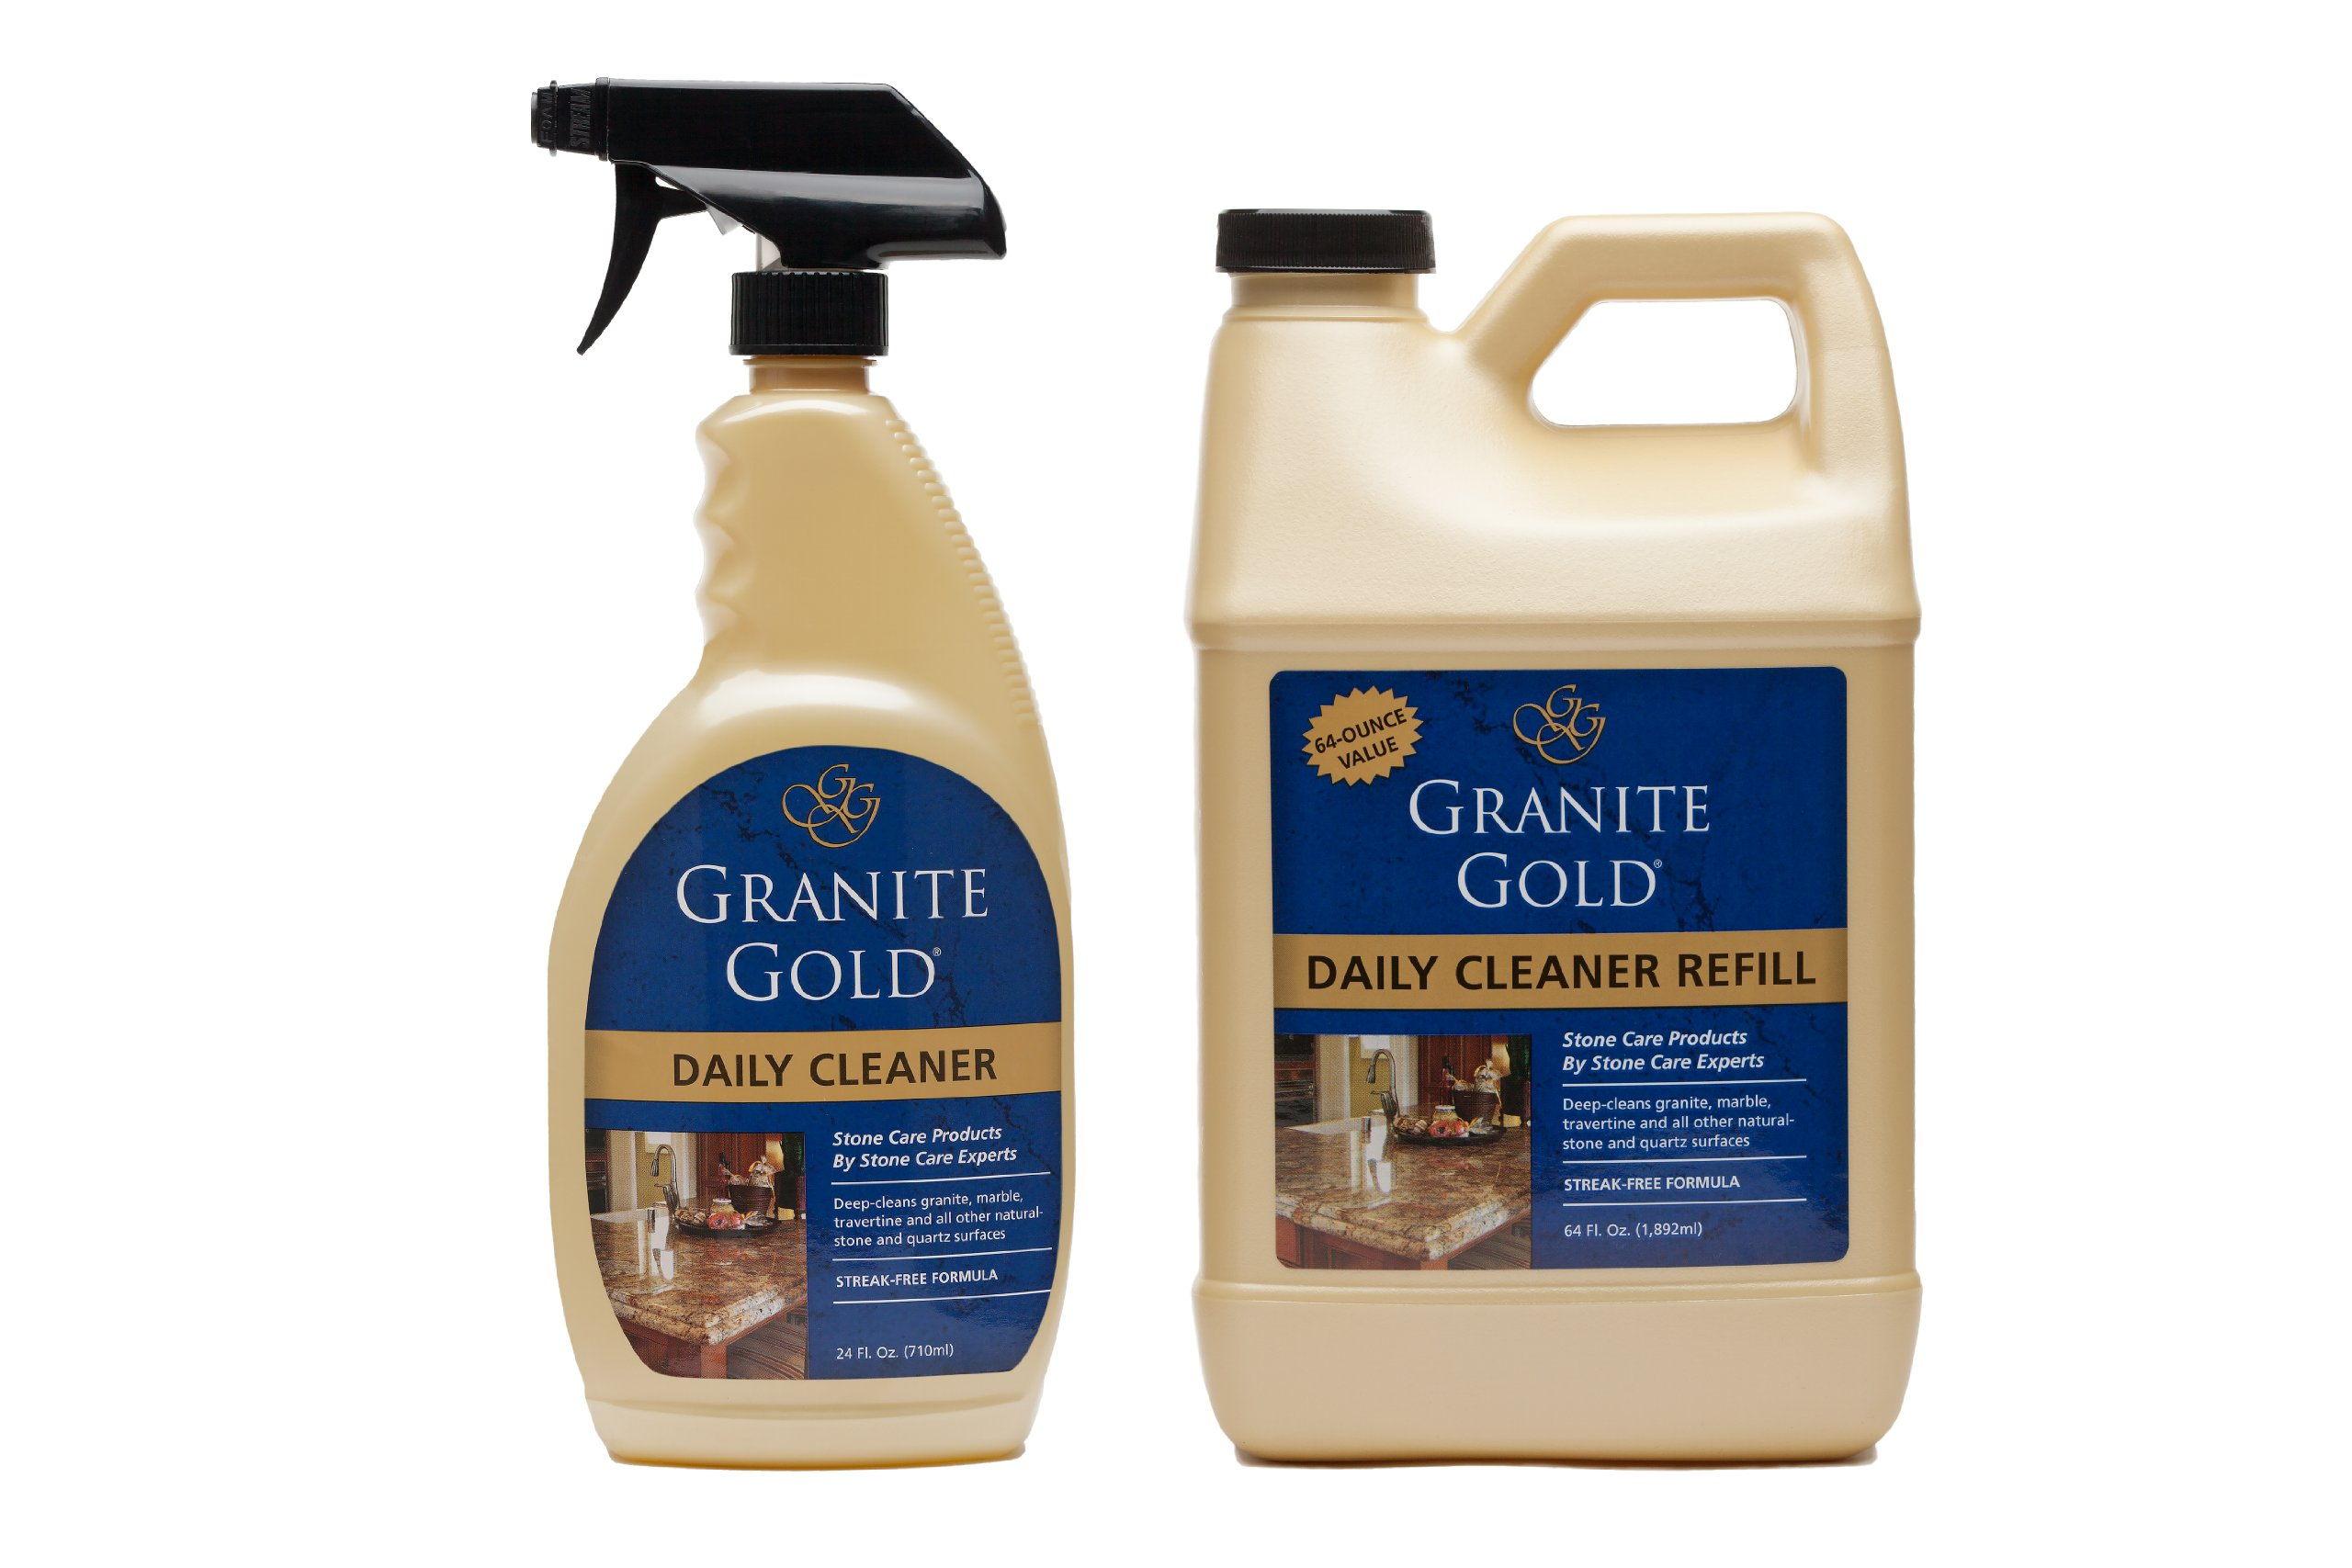 Buy Granite Gold Now!